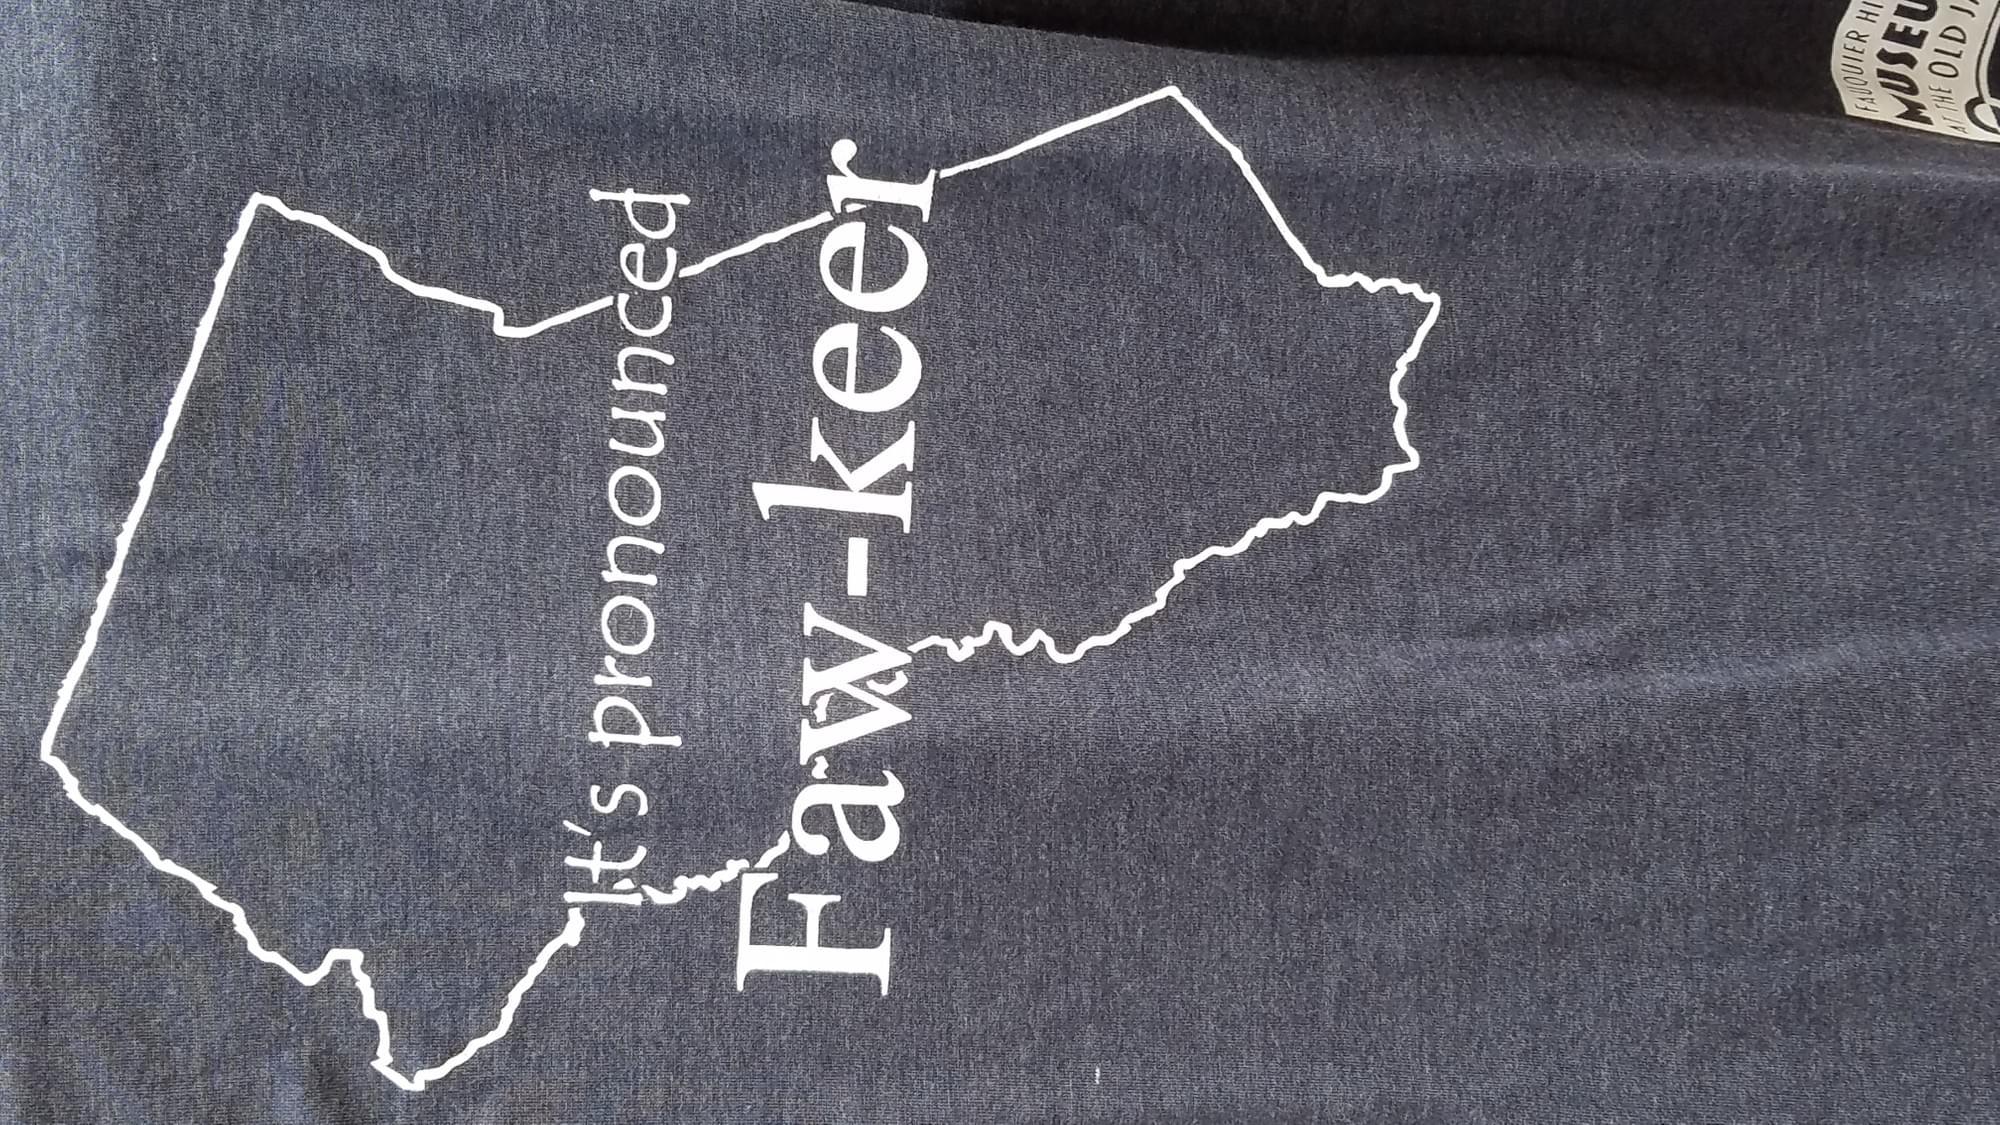 [Faw-Keer] XXXL Short Sleeve T-Shirt